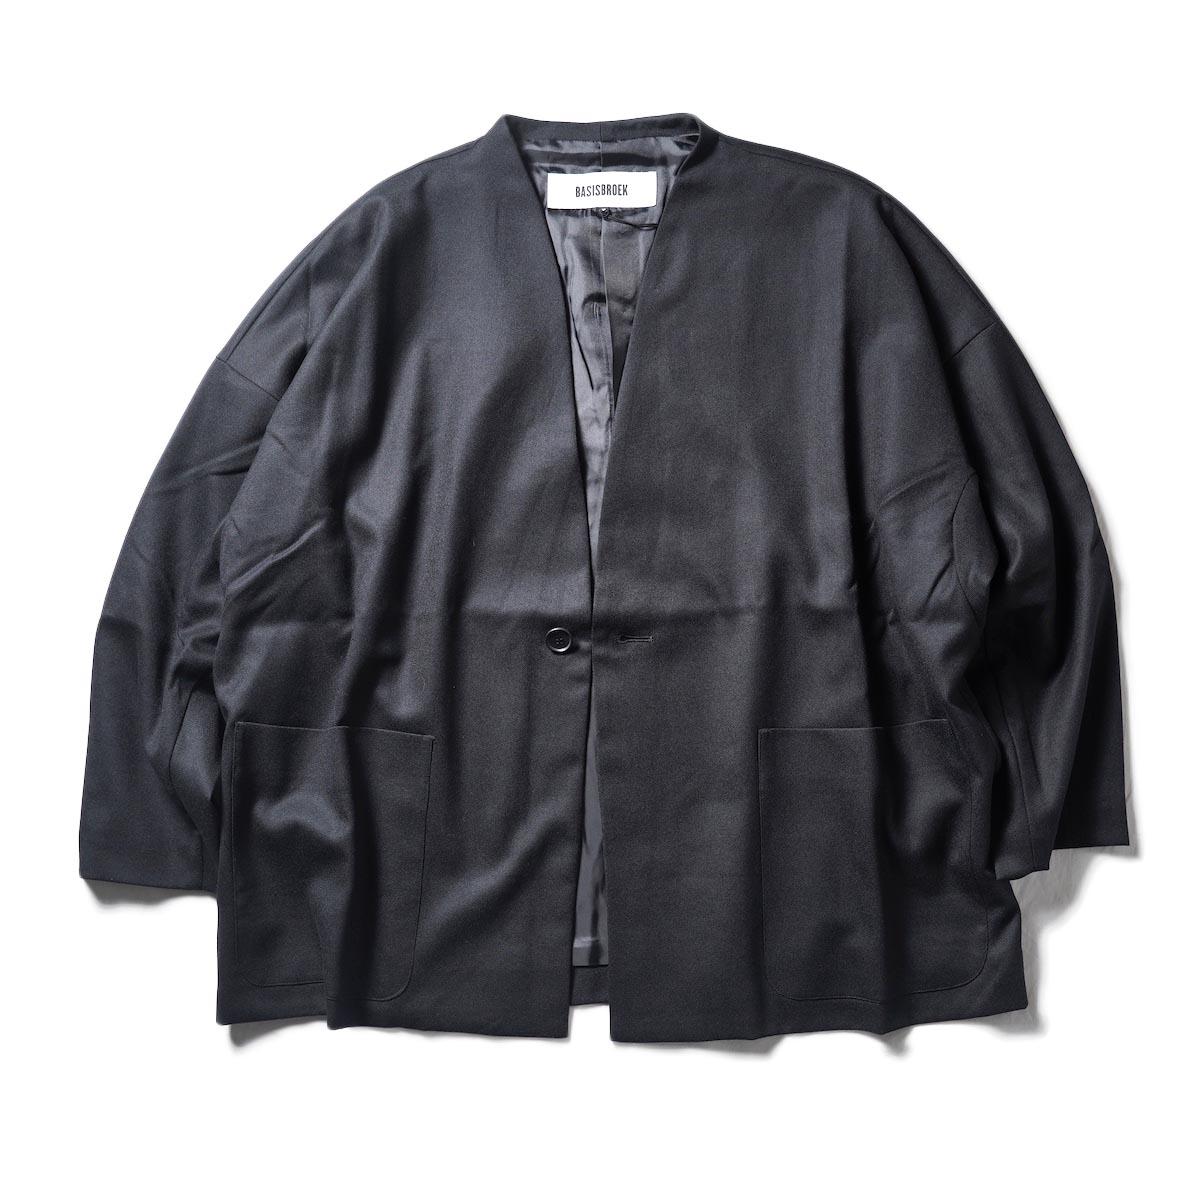 BASISBROEK / BJ-5 LUCHI (Black)